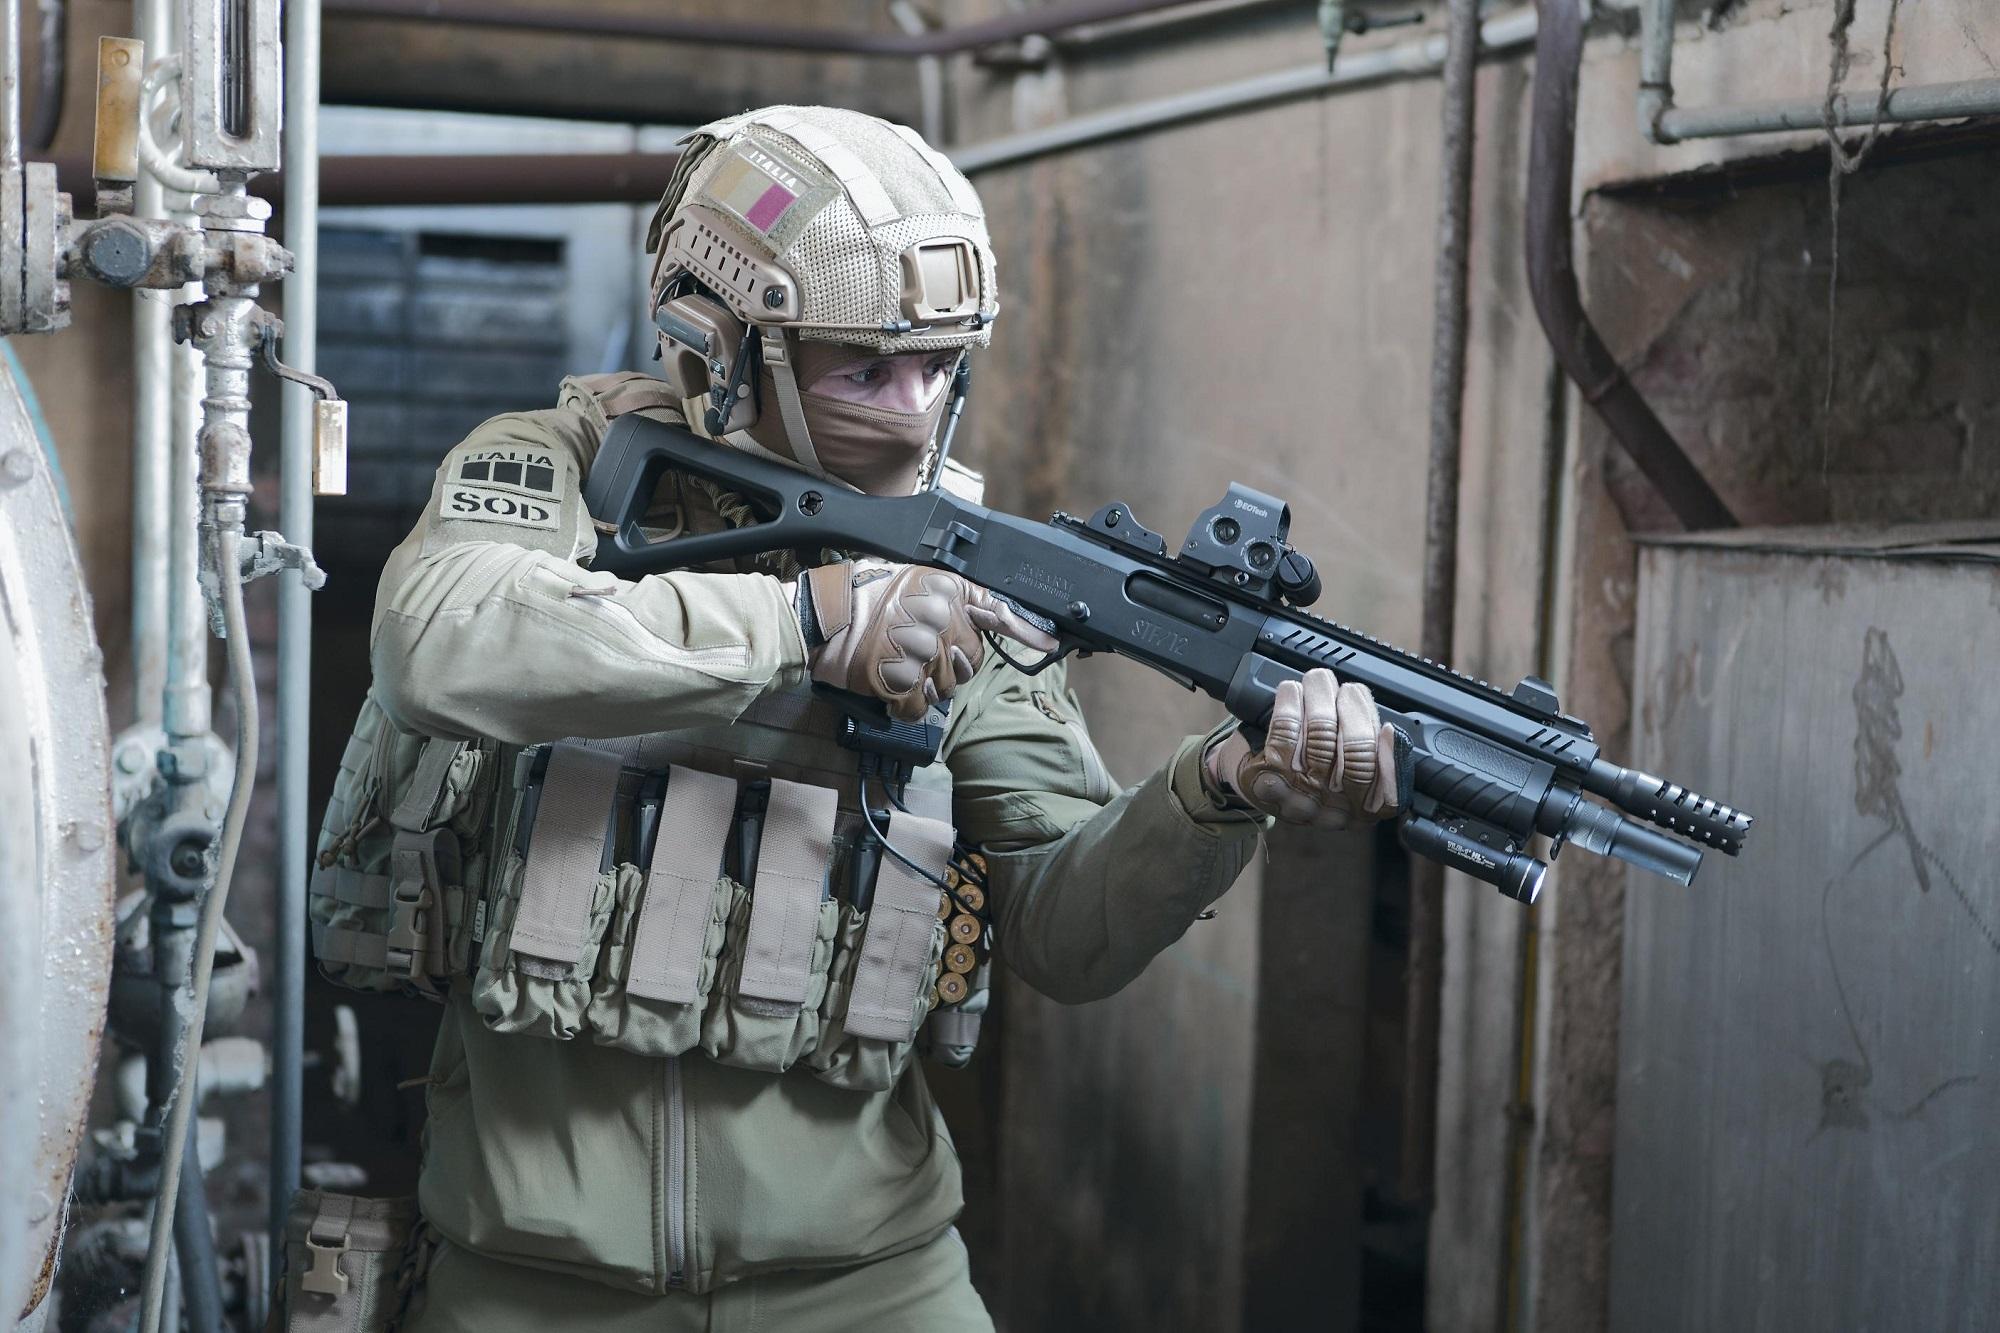 Fabarm STF 12 Modular Pump Action Shotgun System